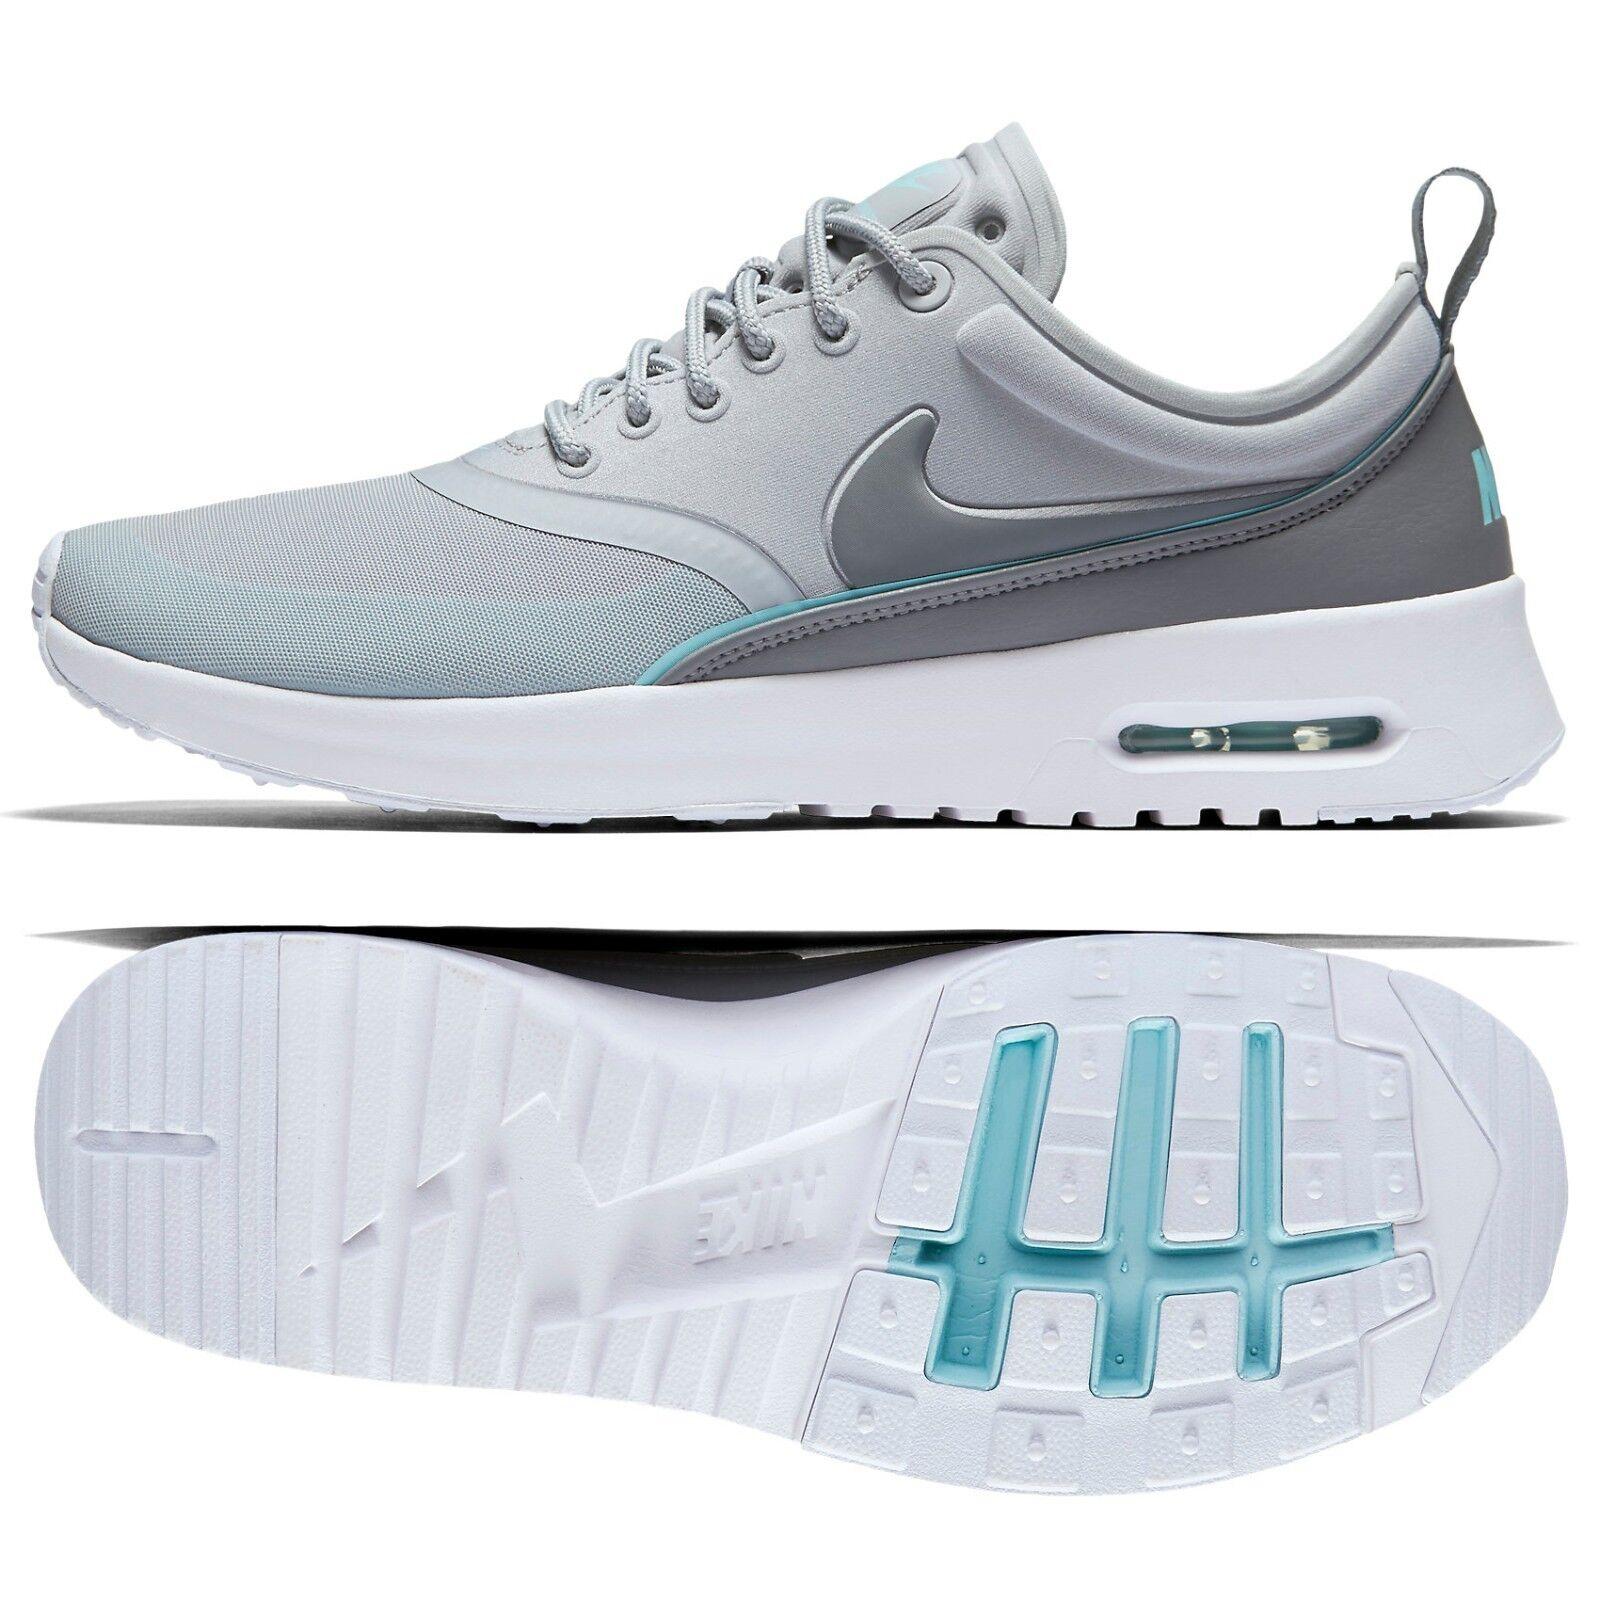 W W W Nike Air Max Thea Ultra 844926-002 gris malla Copa Tinte Azul Zapatos De Mujer  descuento de bajo precio